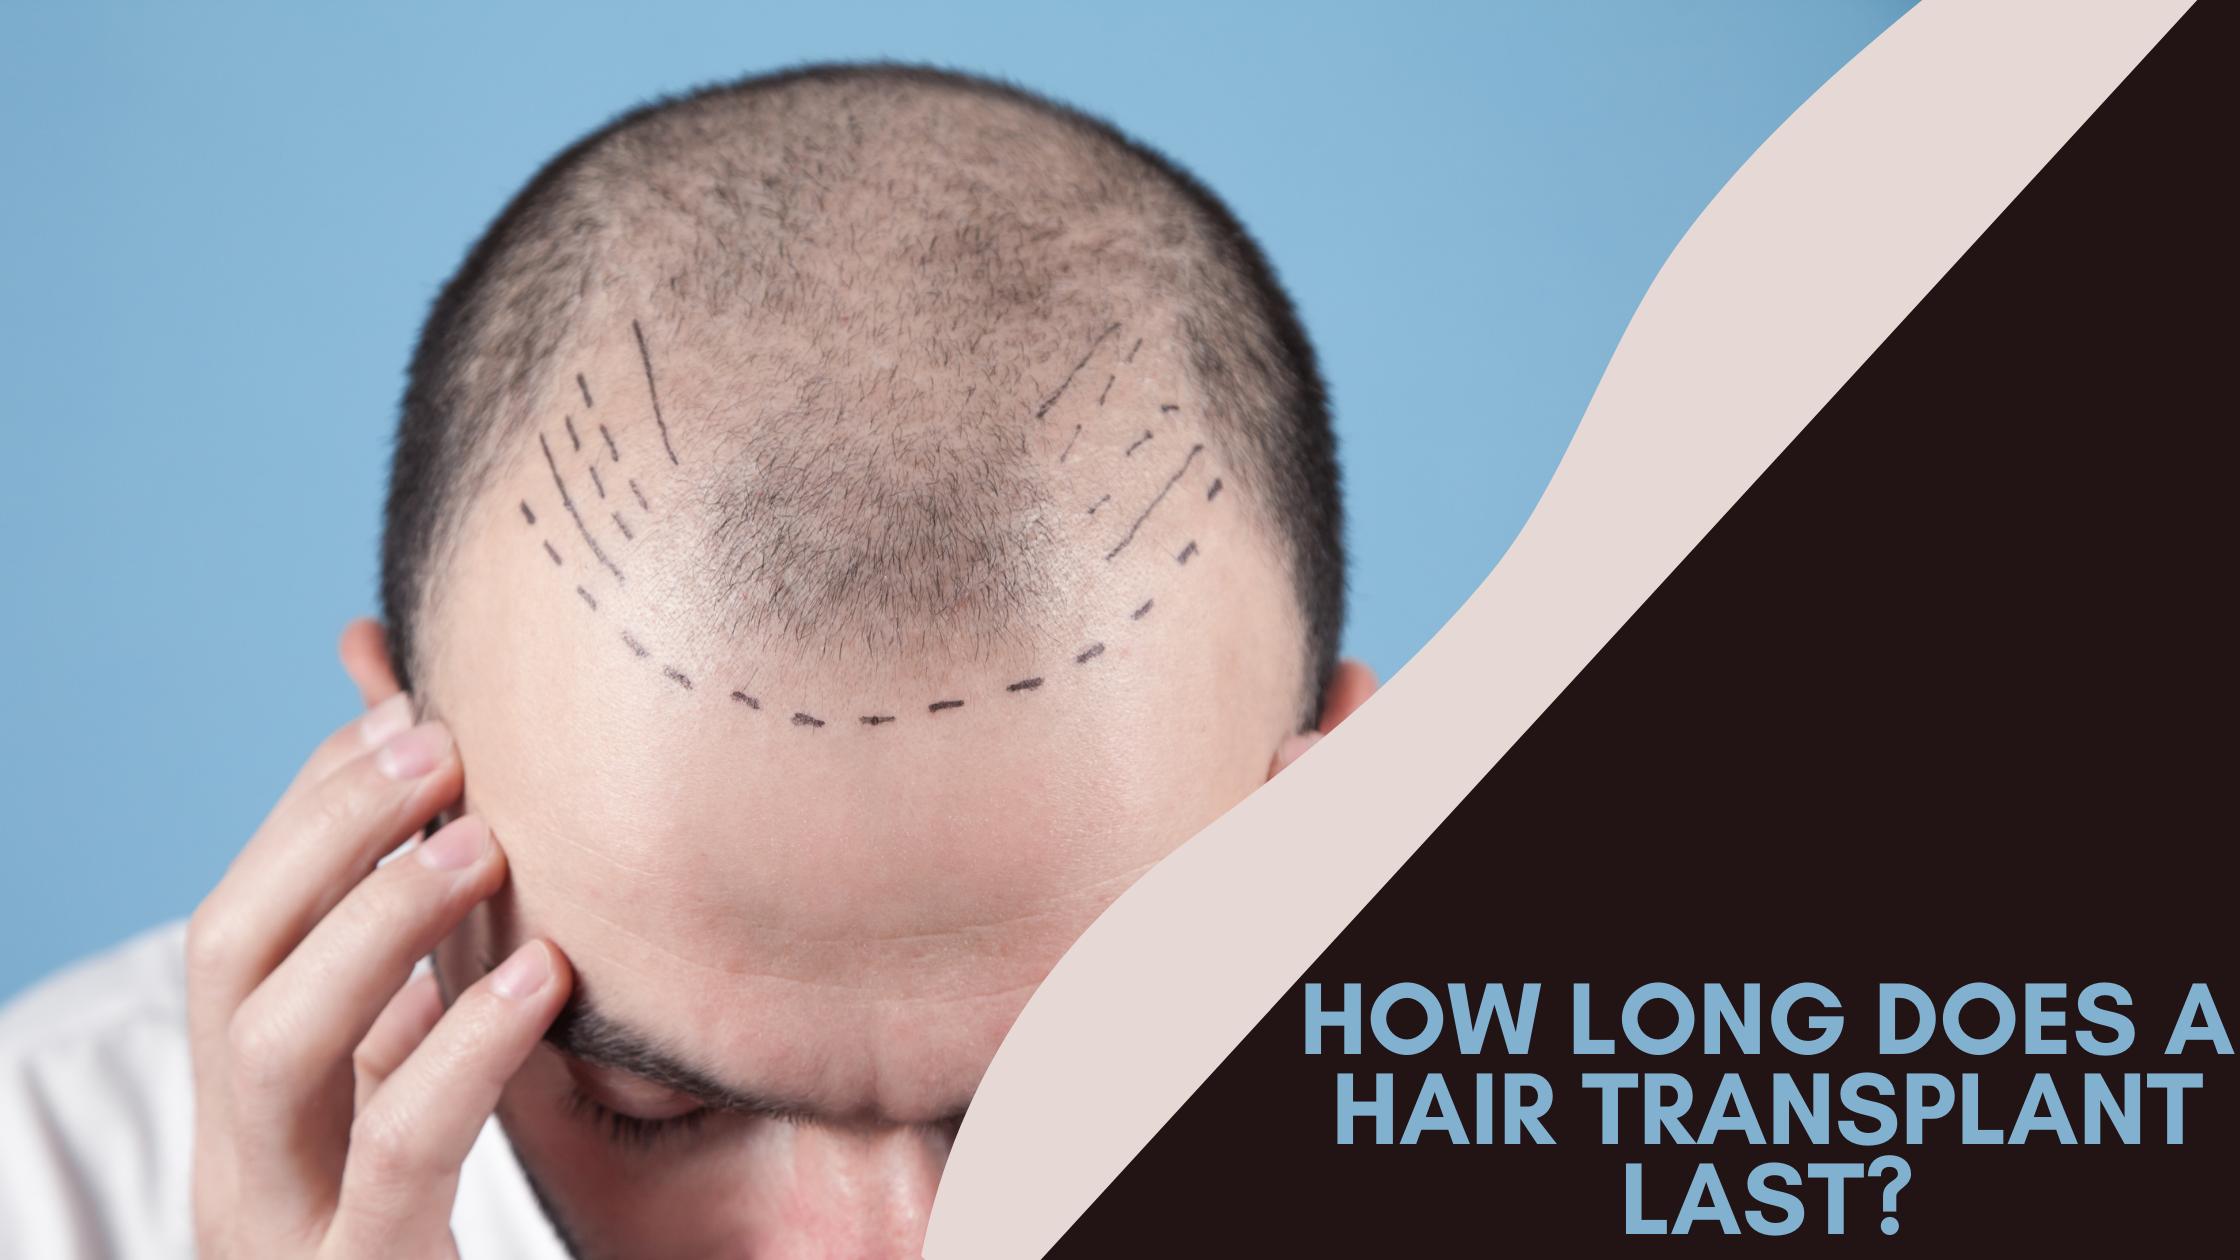 How long does hair transplant last